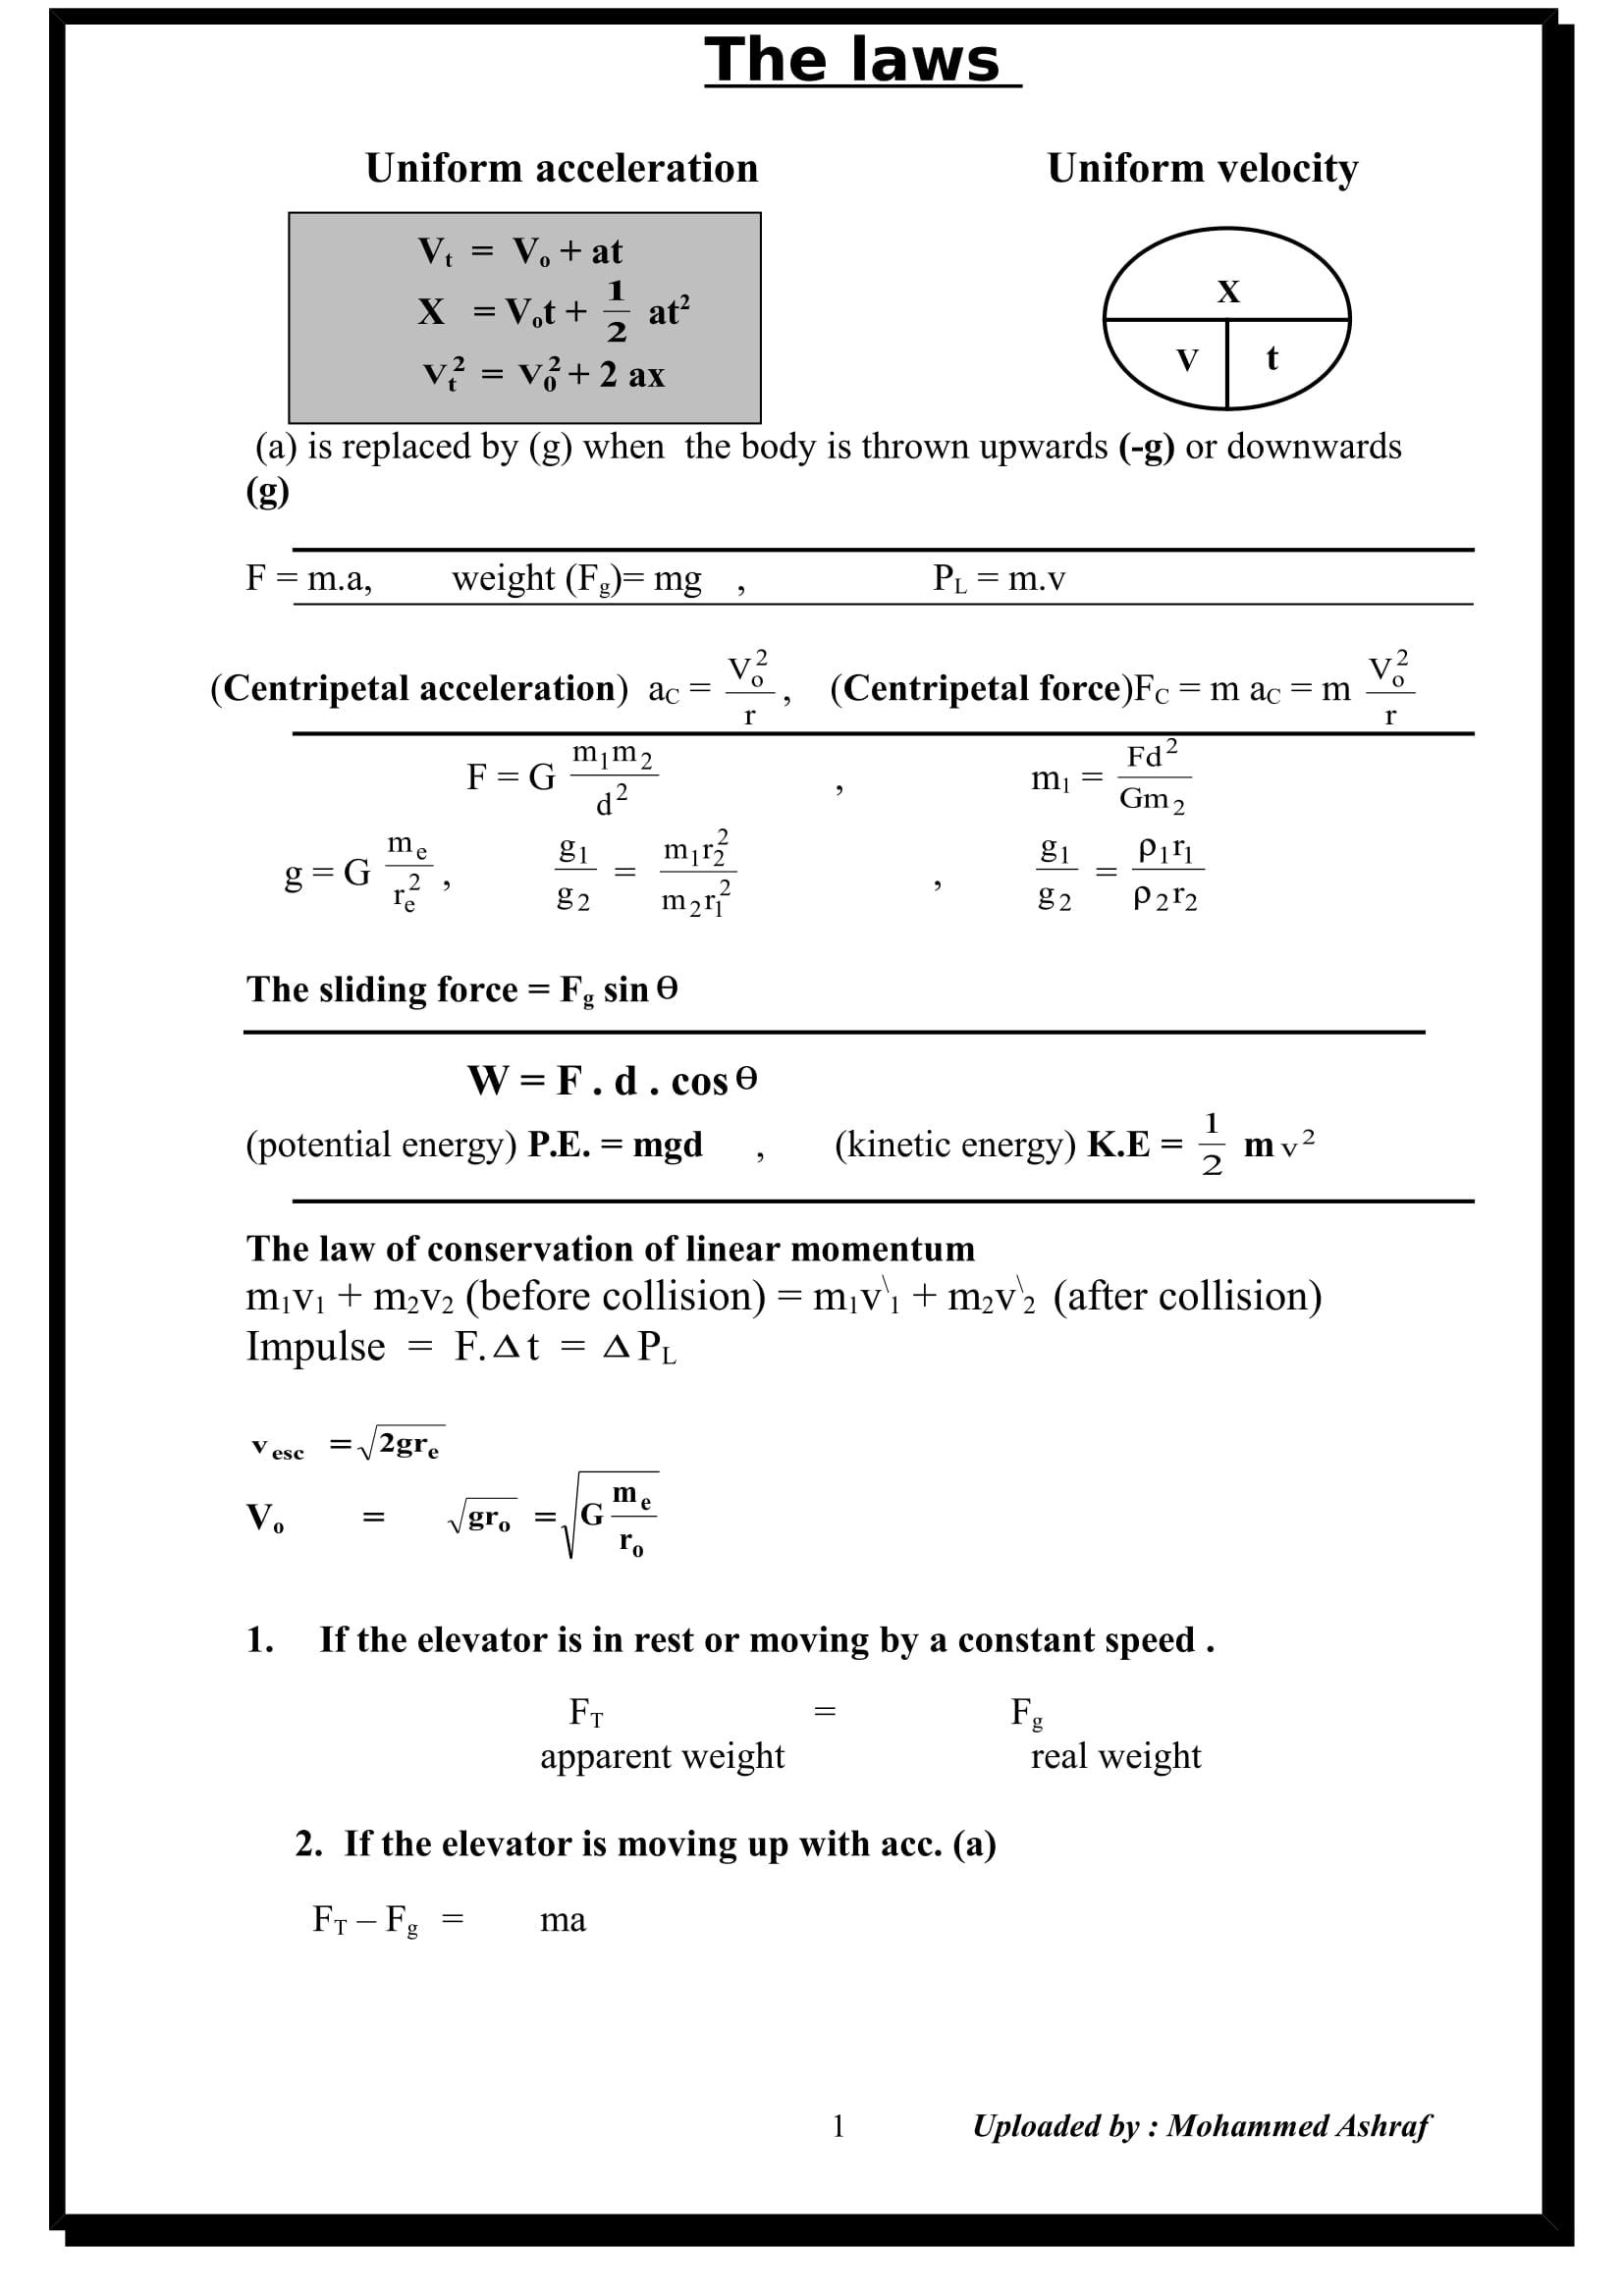 exam-eg.com_1511447110561.jpg